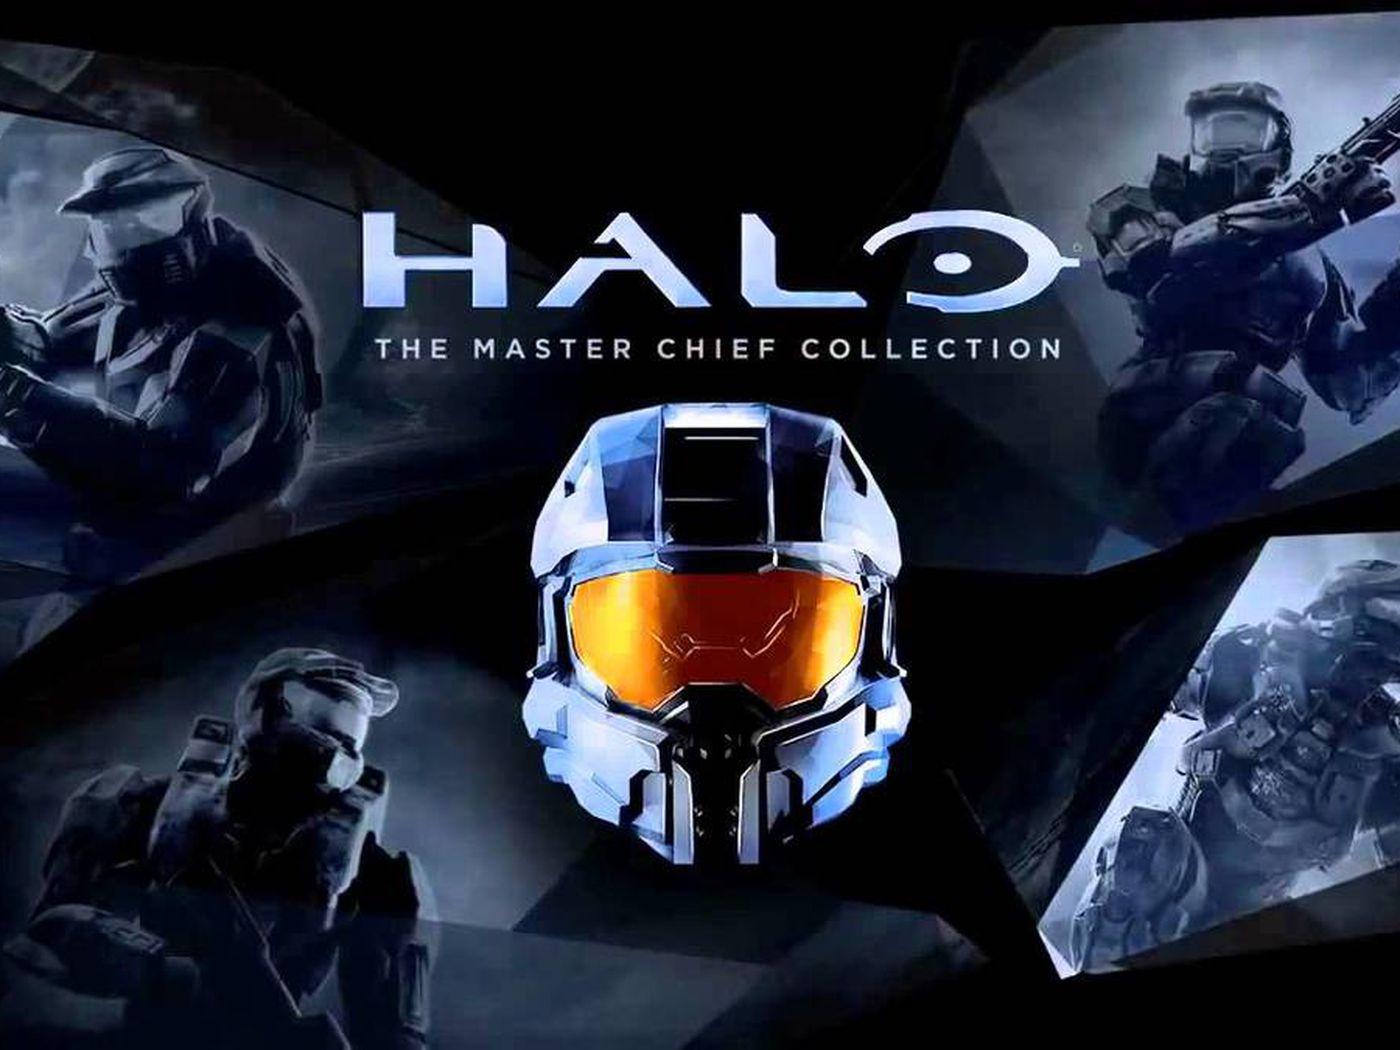 Halo Master Chief Steam Sale